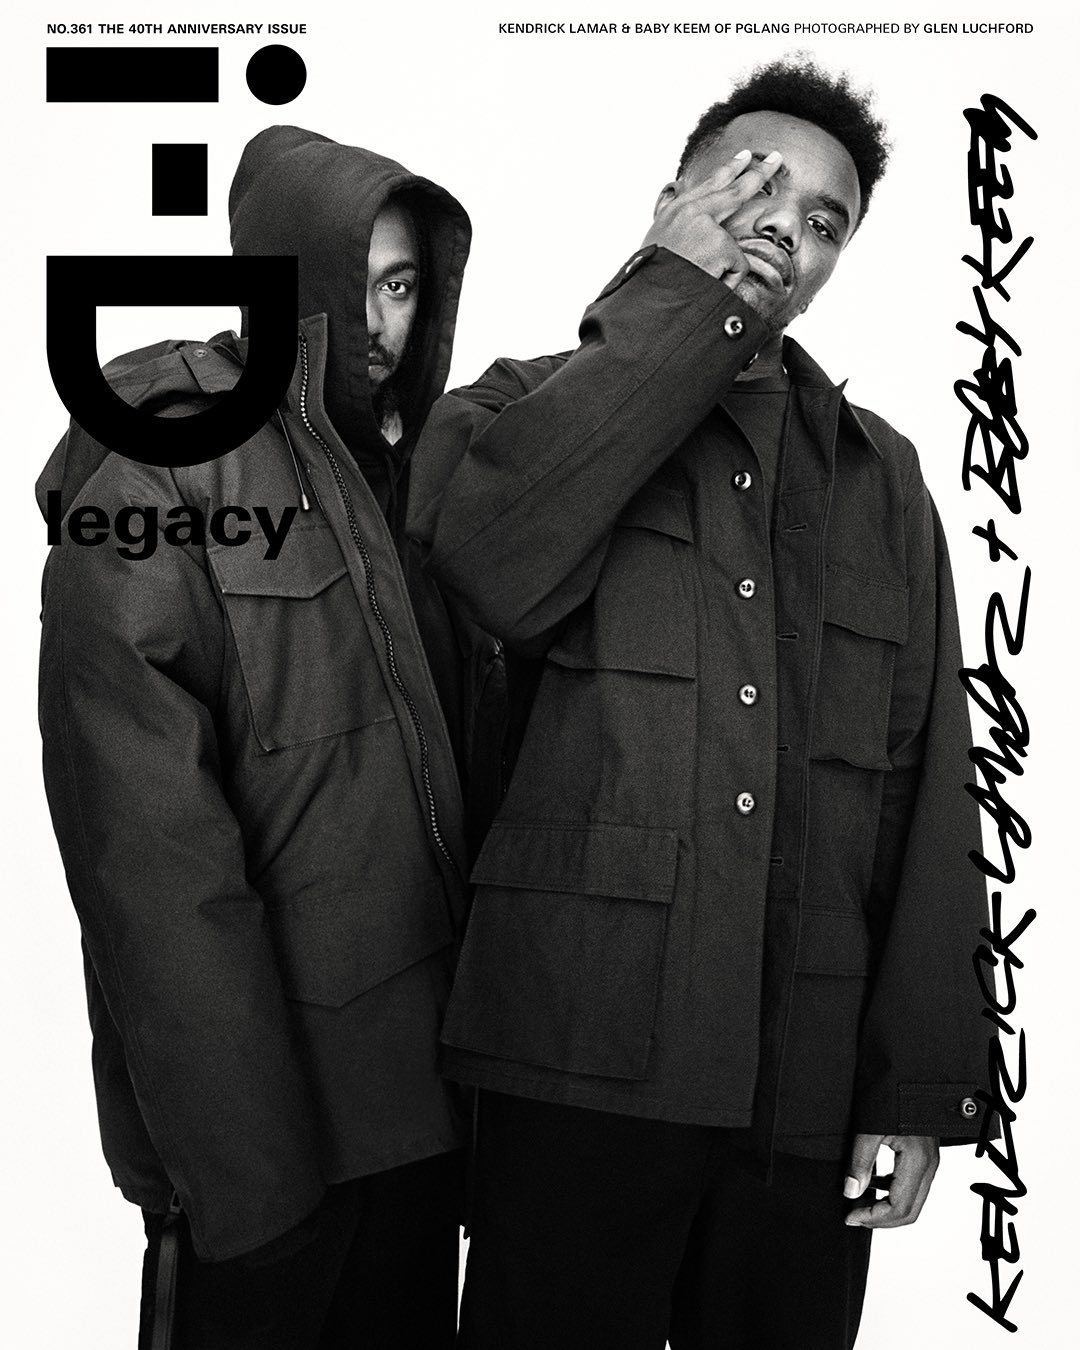 Kendrick+Lamar+and+Baby+Keem+collaborate+for+pgLang